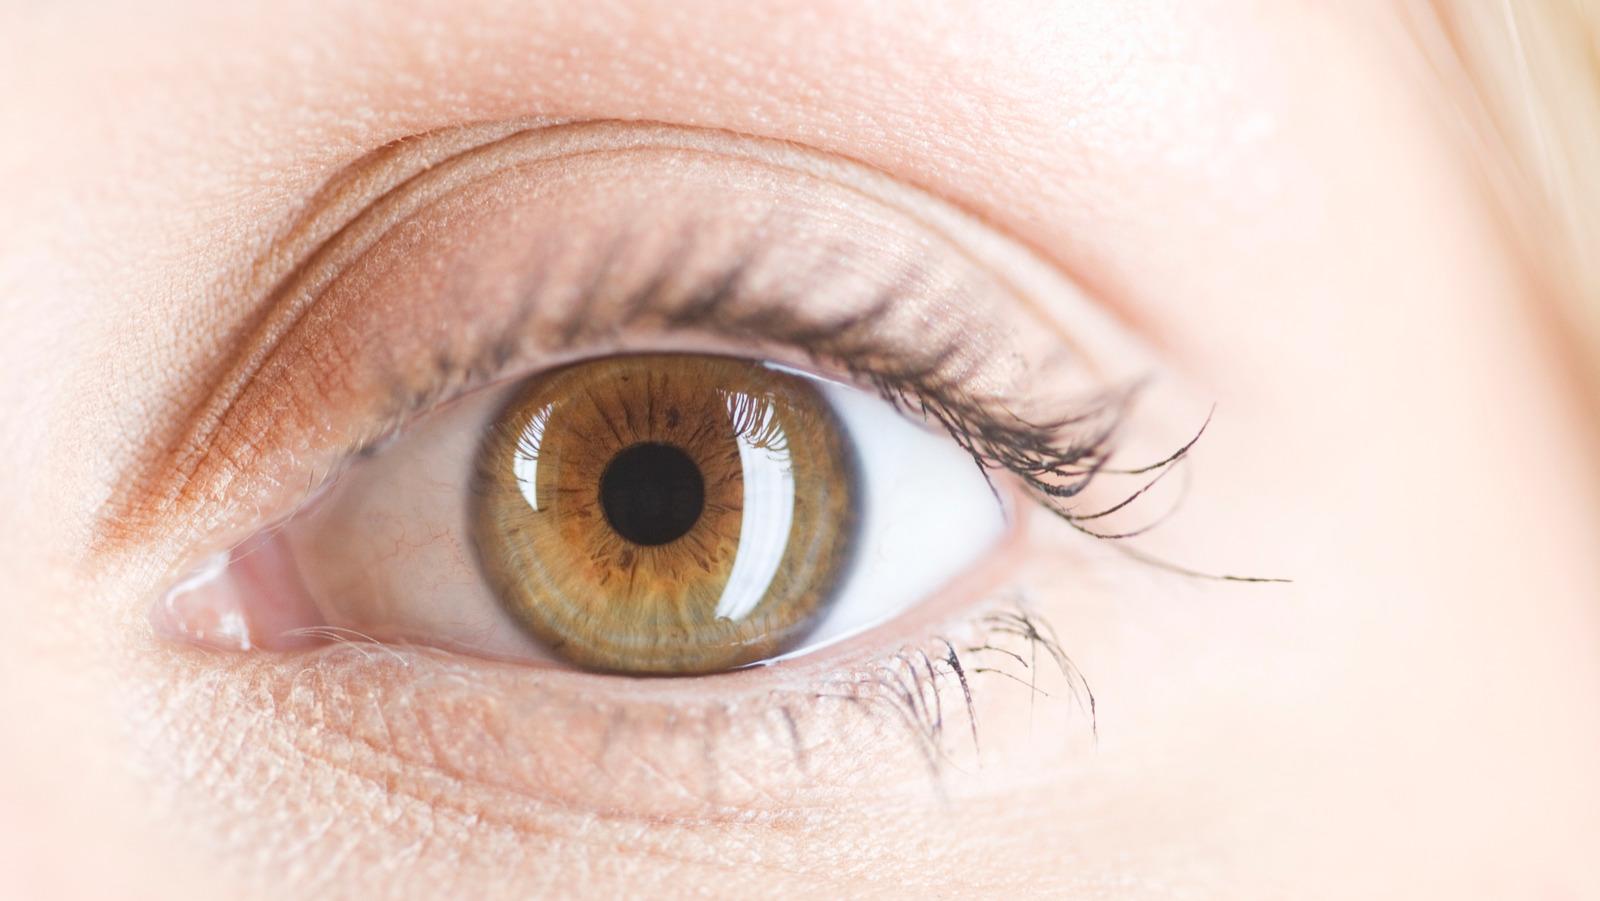 Hazel of eyes meaning the Brown Eyes